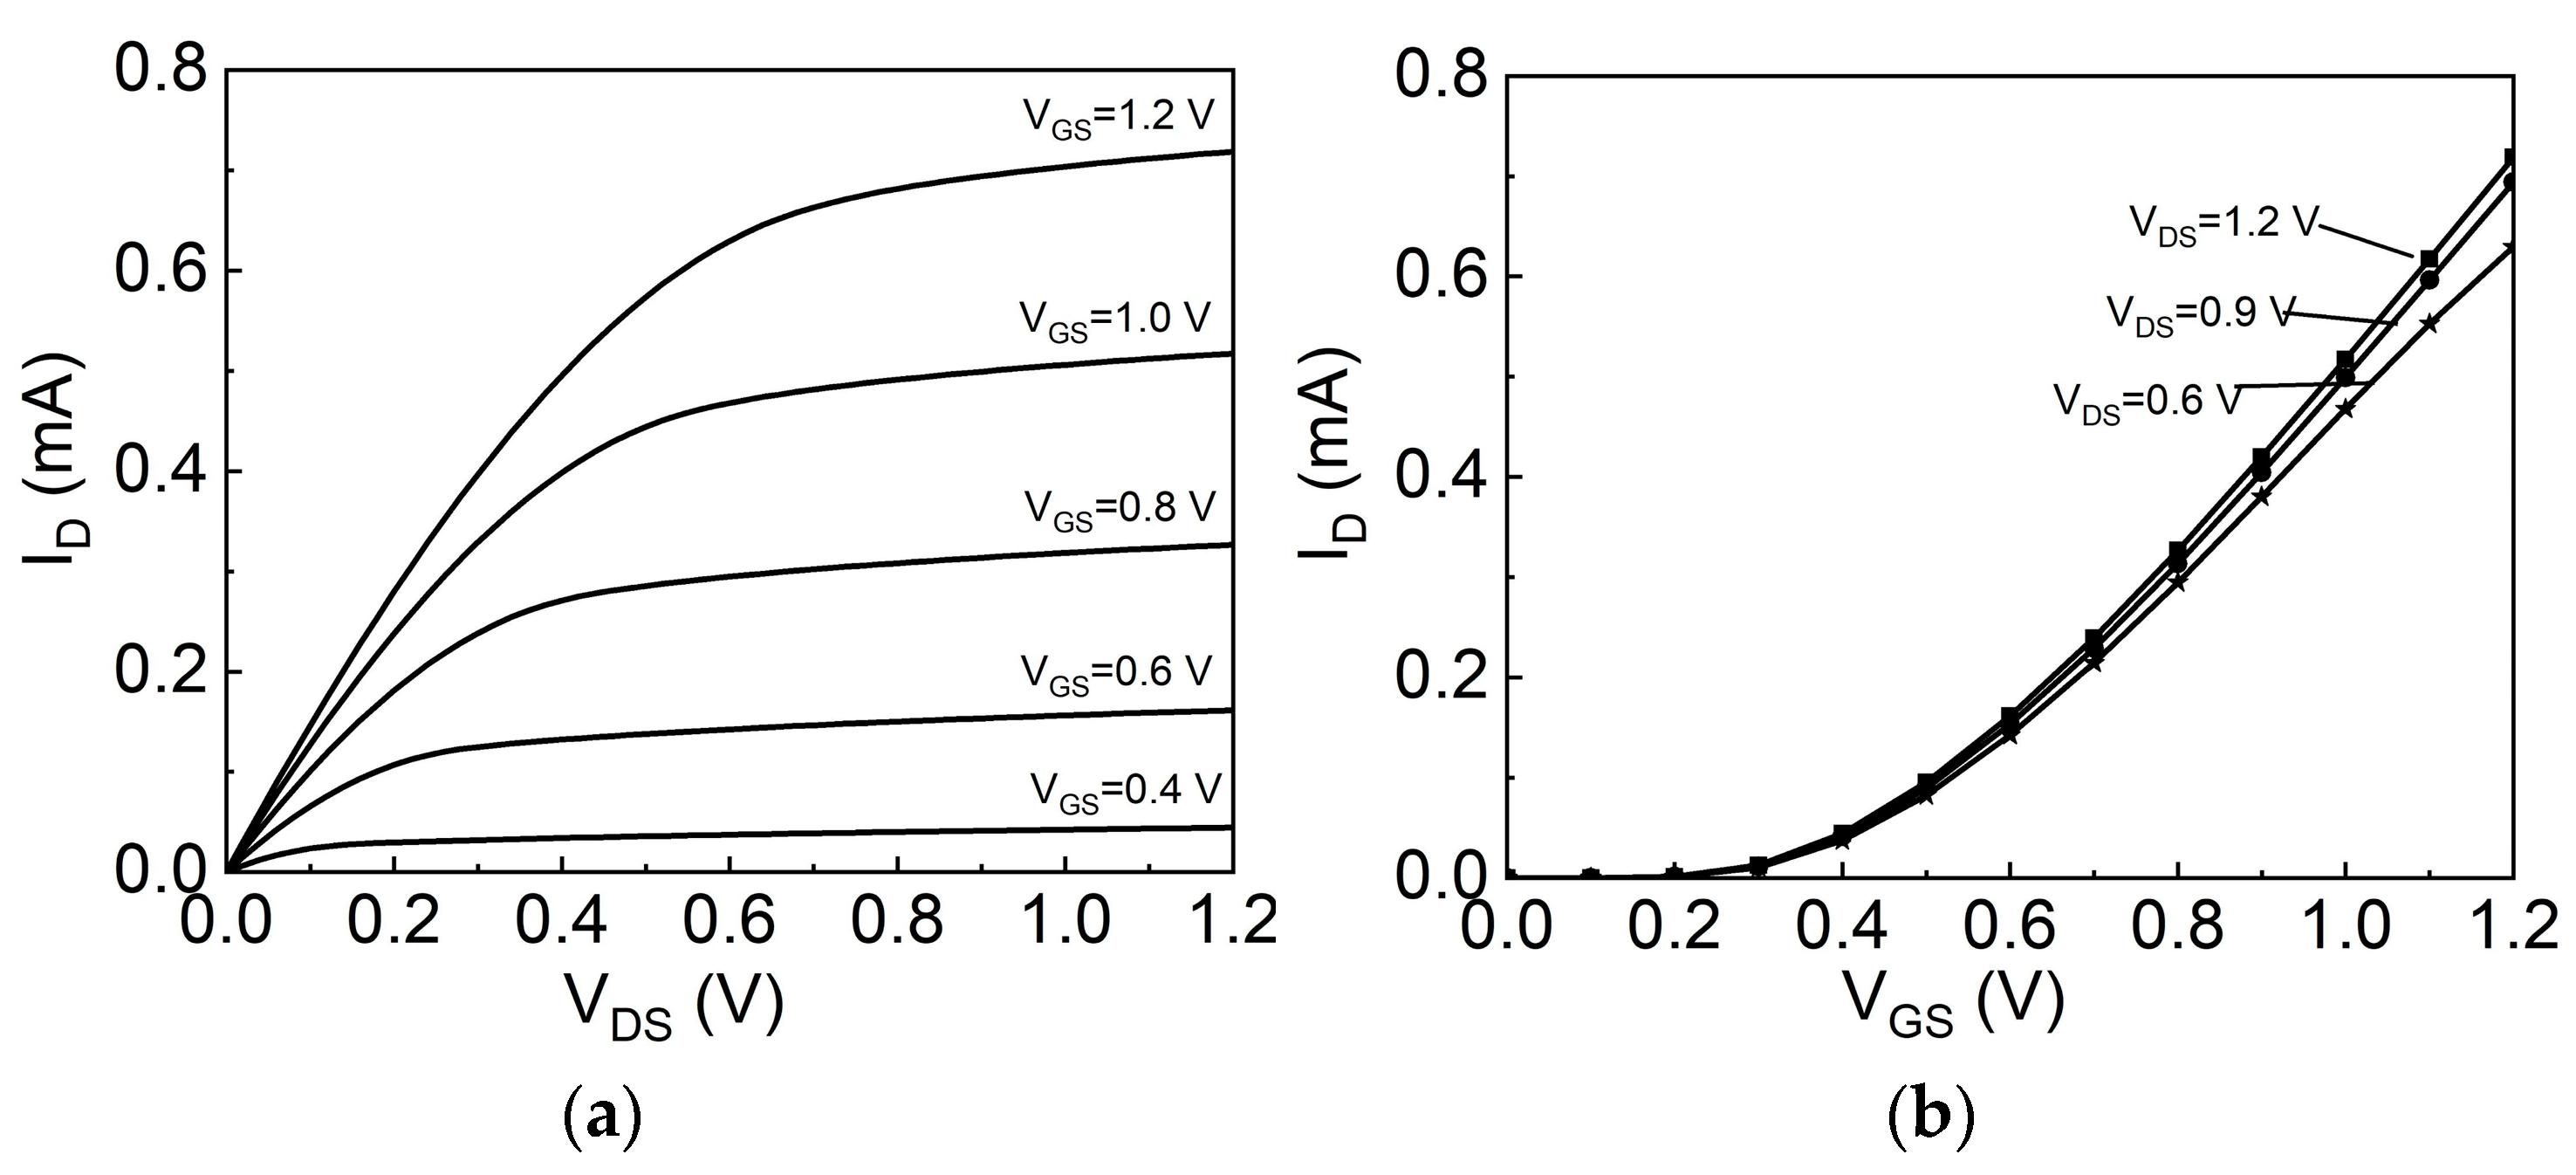 Single Transistor Amp Characteristic Curves